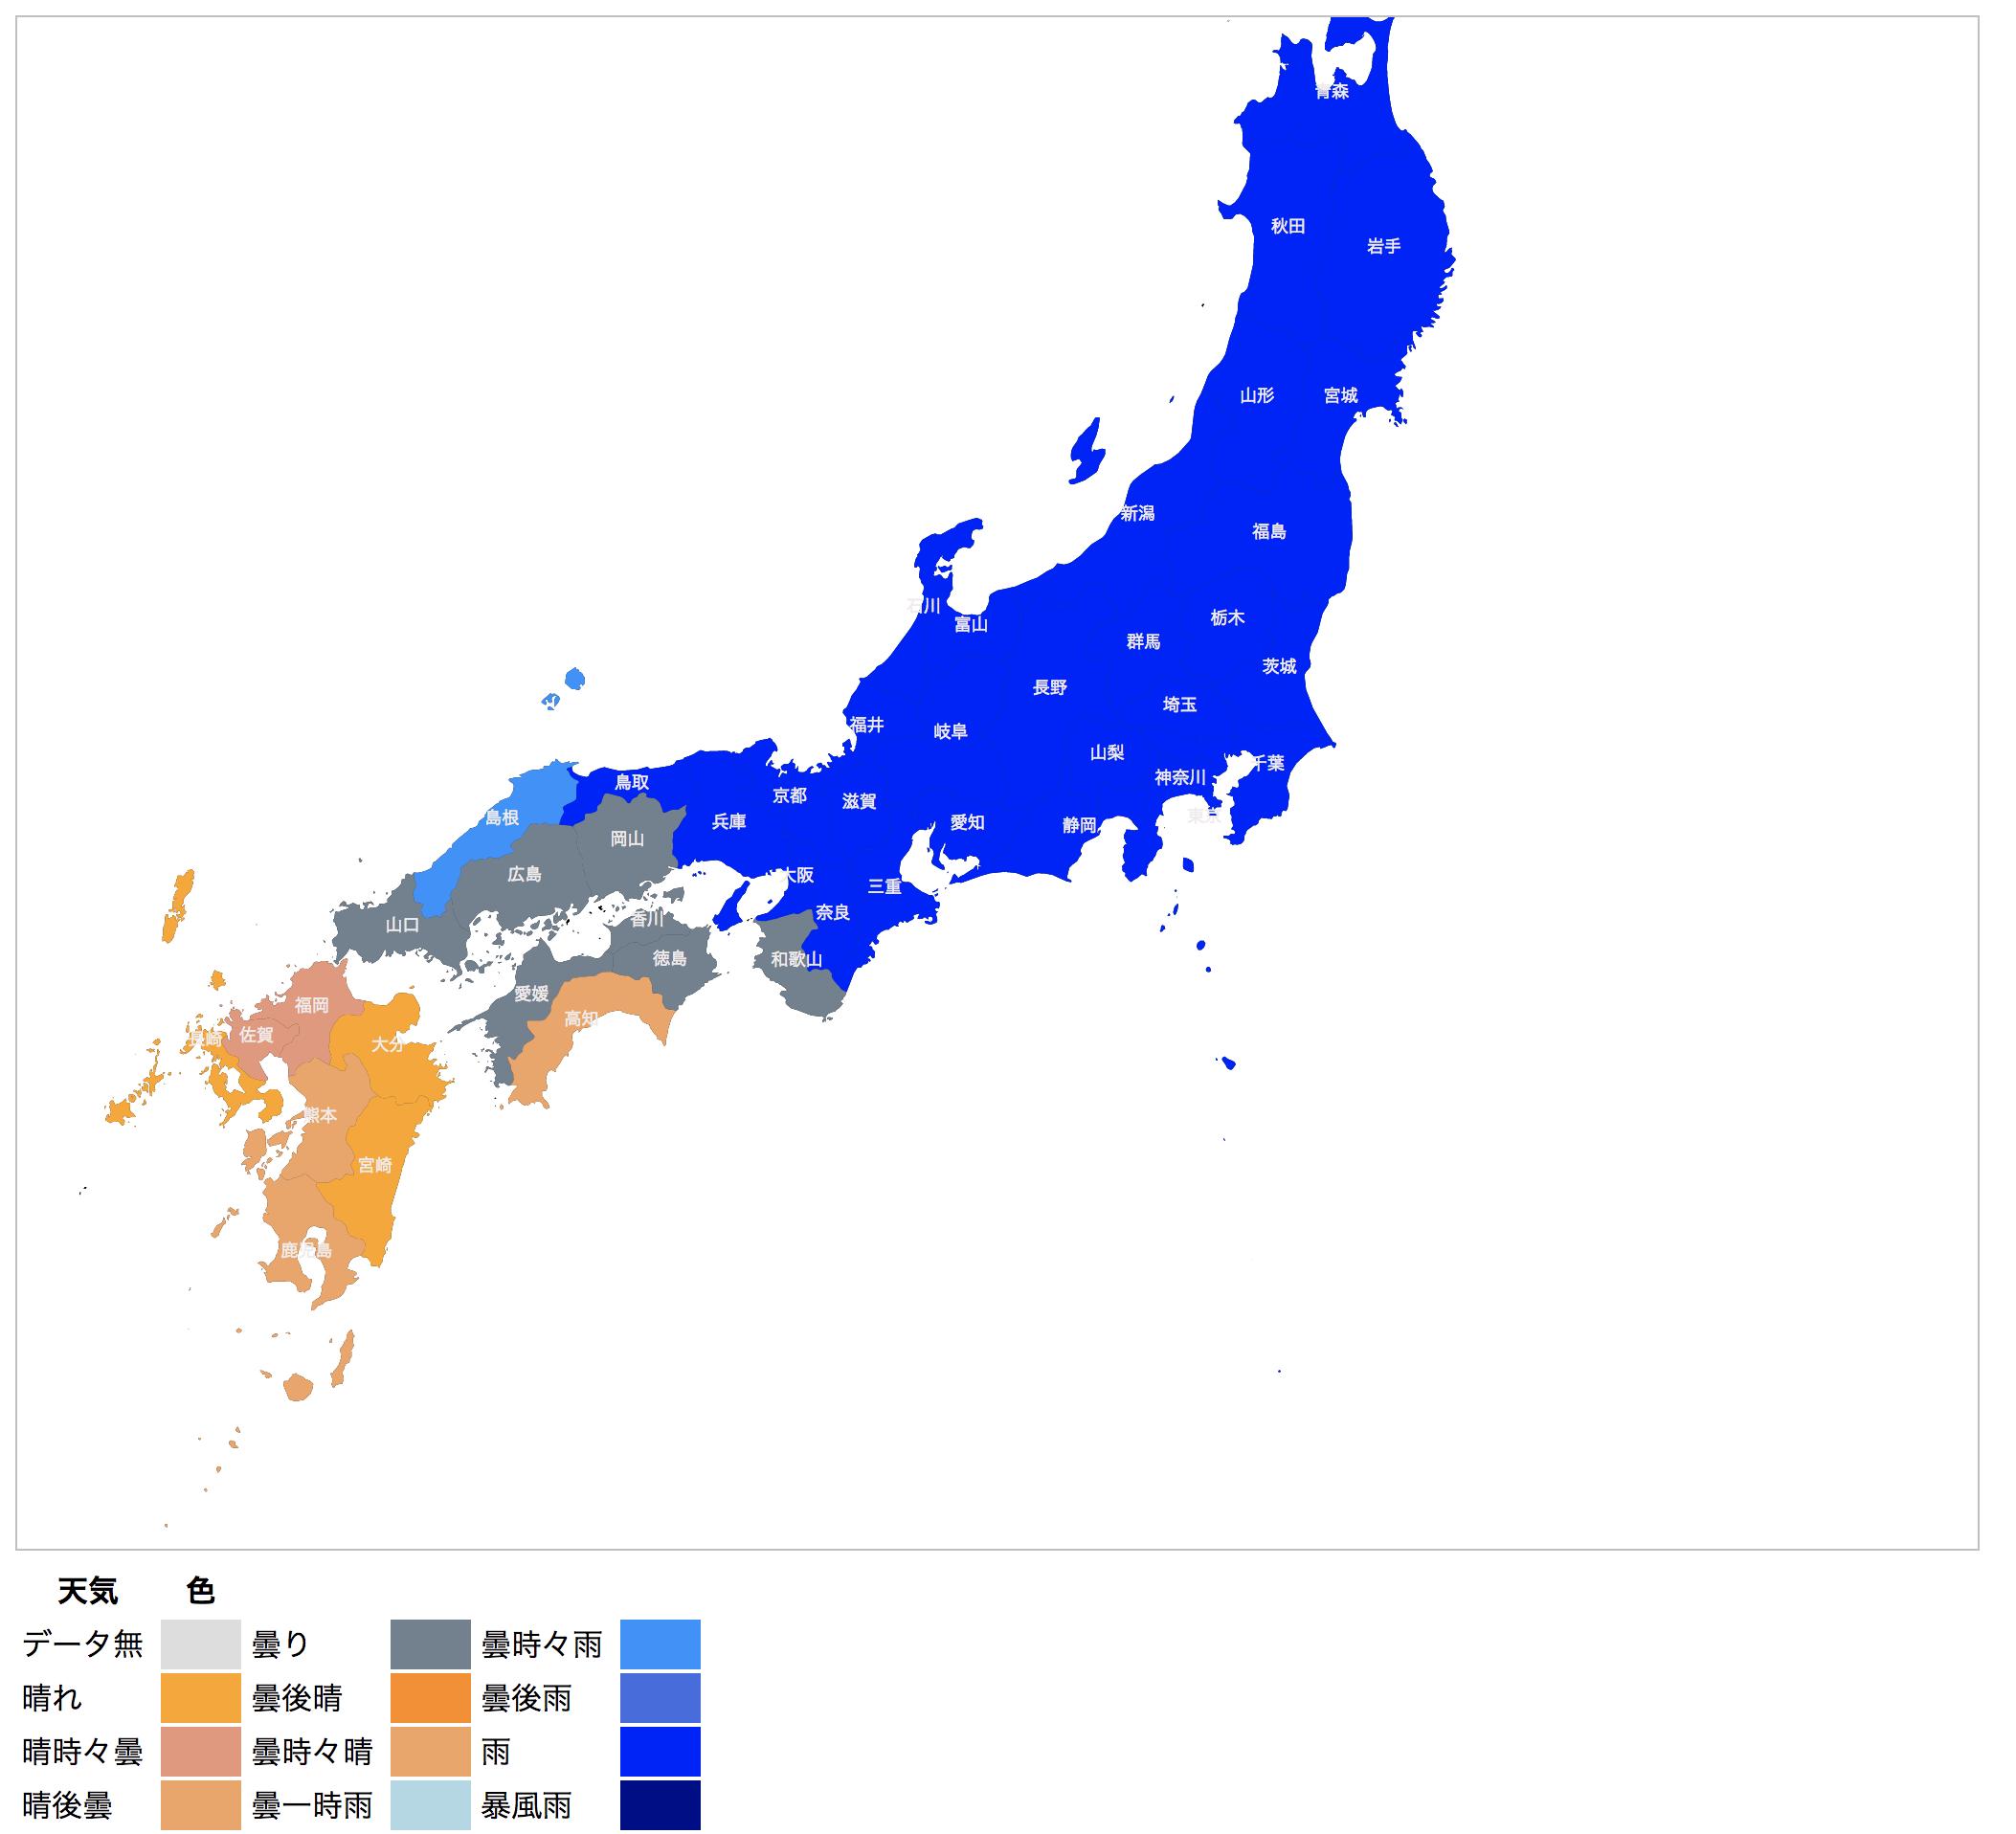 screencapture-localhost-1337-tenki-map-html-1509279289209.png